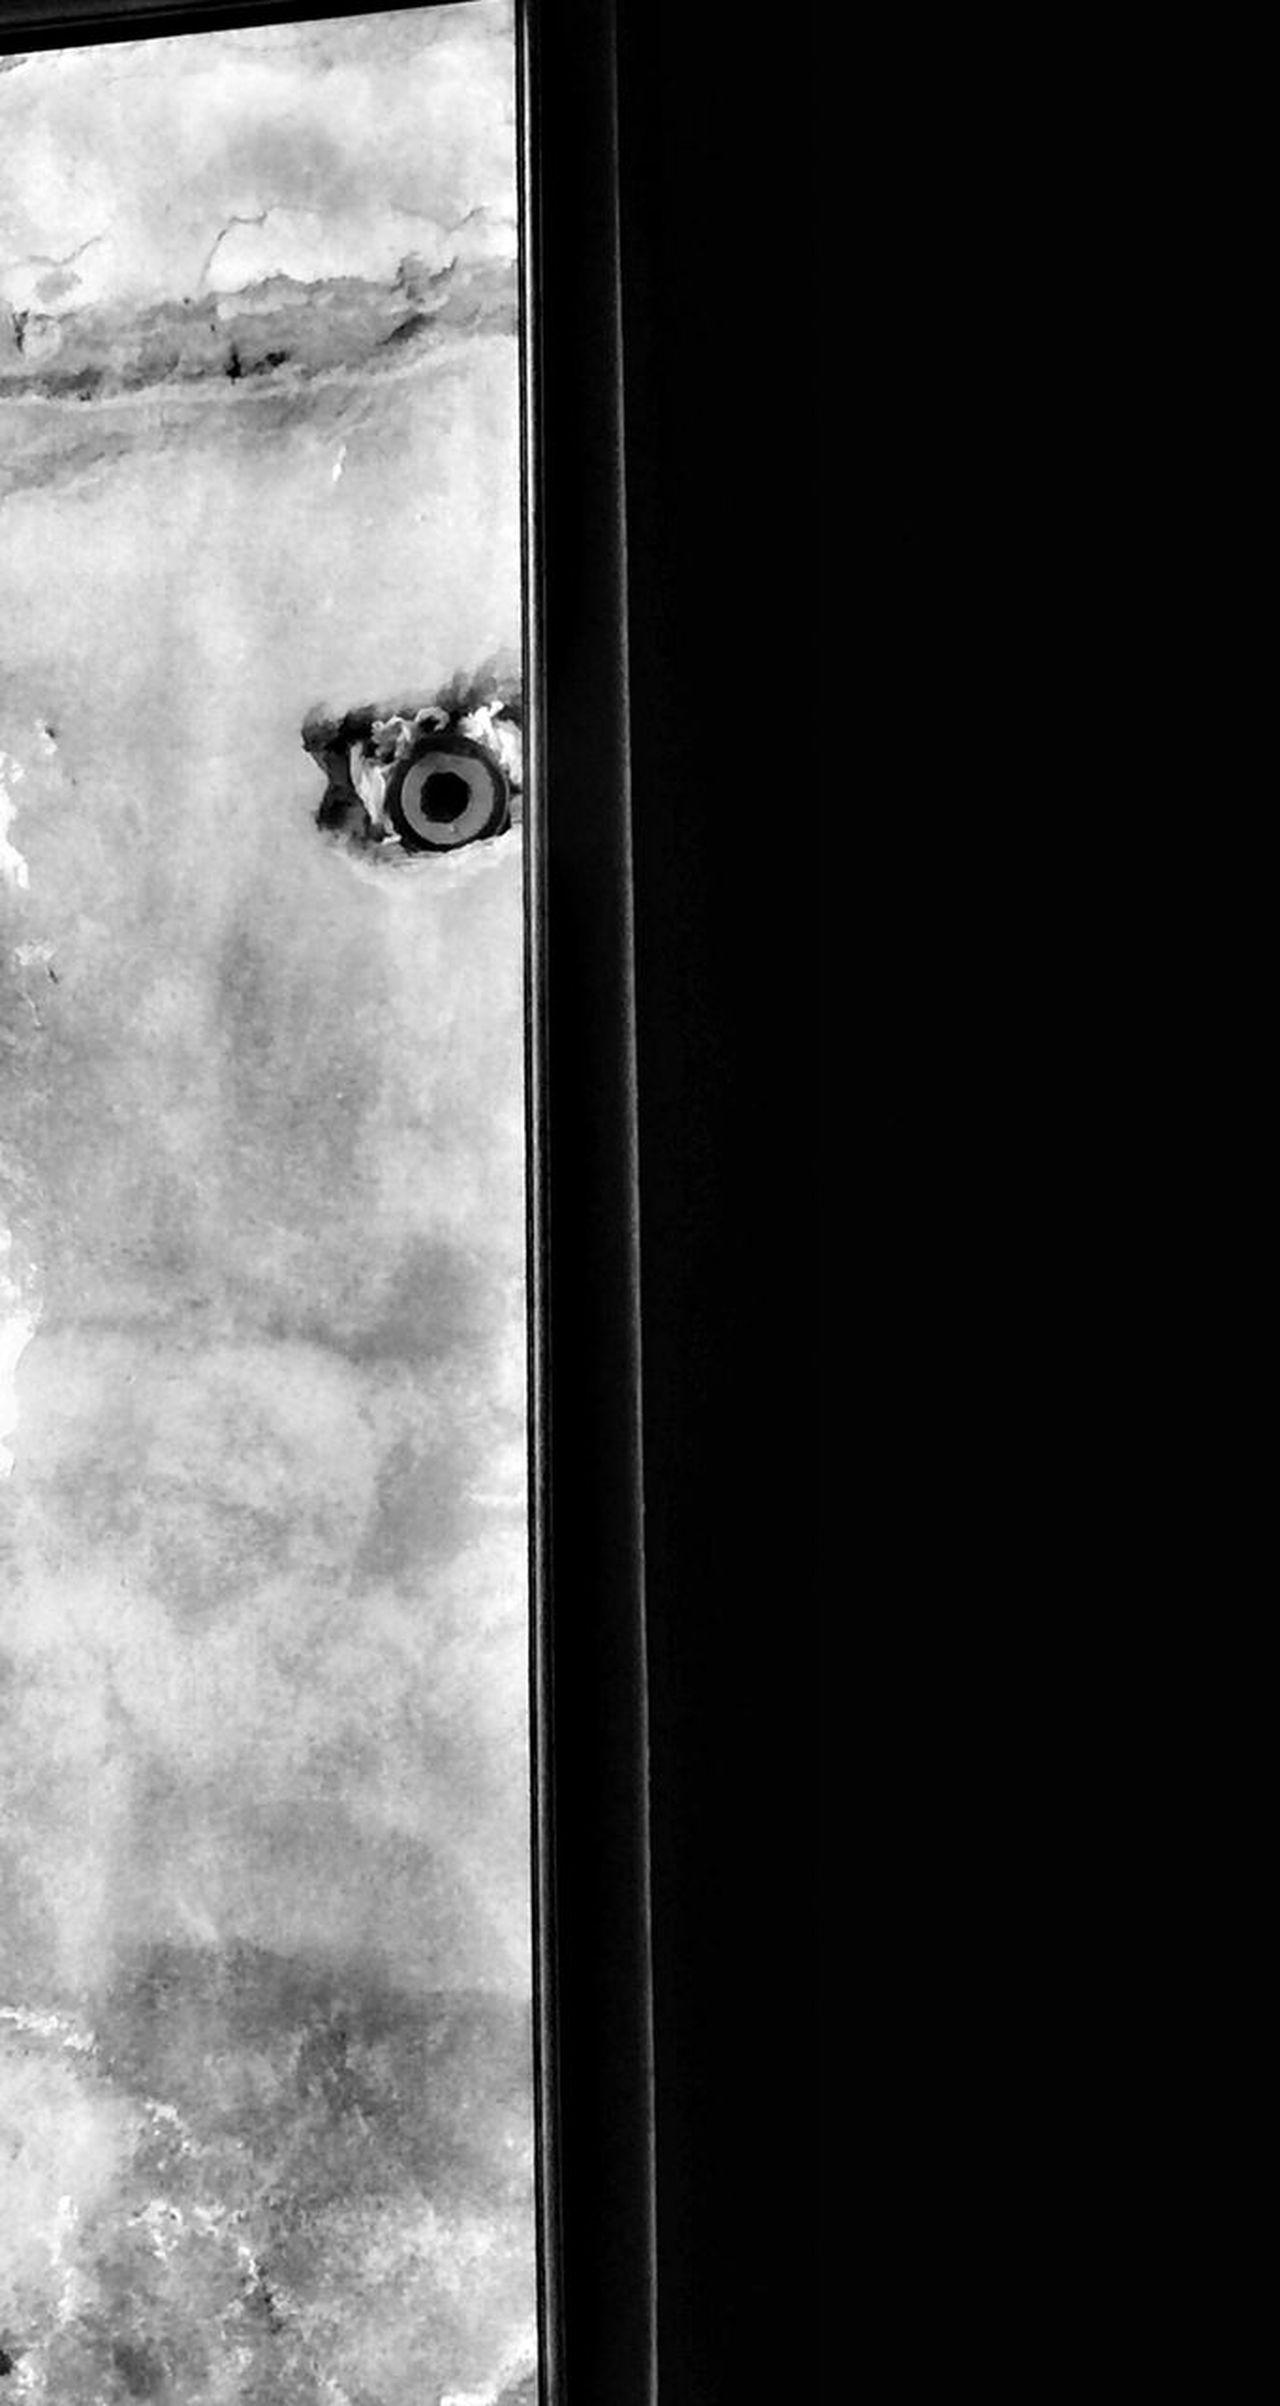 Eyeembestshots - Black + White Blackandwhite #bnw #monochrome #TagsForLikes #instablackandwhite #monoart #insta_bw #bnw_society #bw_lover #bw_photooftheday #photooftheday #bw #instagood #bw_society #bw_crew #bwwednesday #insta_pick_bw #bwstyles_gf #irox_bw #igersbnw #bwstyleoftheday #m EyeEm Best Shots - Black + White Turkey #Turkiye #istanbul #istanbuldayasam #istanbullovers #istanbullove #istanbullife #izmir #Ankara #Adana #Bursa #Gaziantep #Konya #Antalya #Mersin #lifeinism #Eskişehir #Eskisehir #Samsun #Denizli #tagsforhearts #Bodrum #Alanya #igturkey #tr #TC #inst IPhoneography EyeEm Best Shots EyeEm The Best Shots EyeEm Best Edits EyeEm Gallery EyeEmTurkey EyeEmBestPics HDR